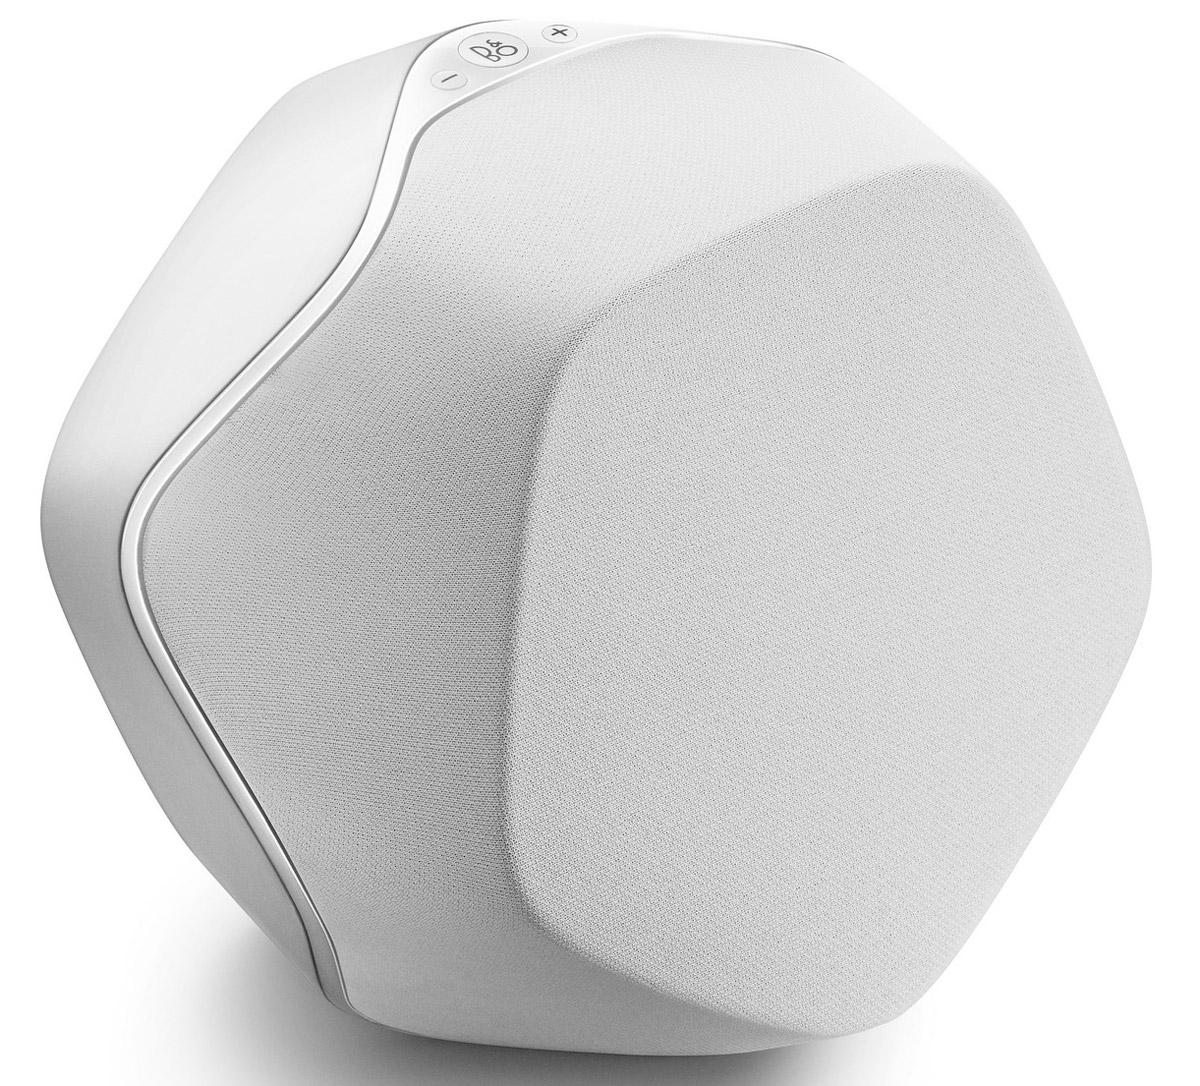 Bang & Olufsen BeoPlay S3, White портативная акустическая система